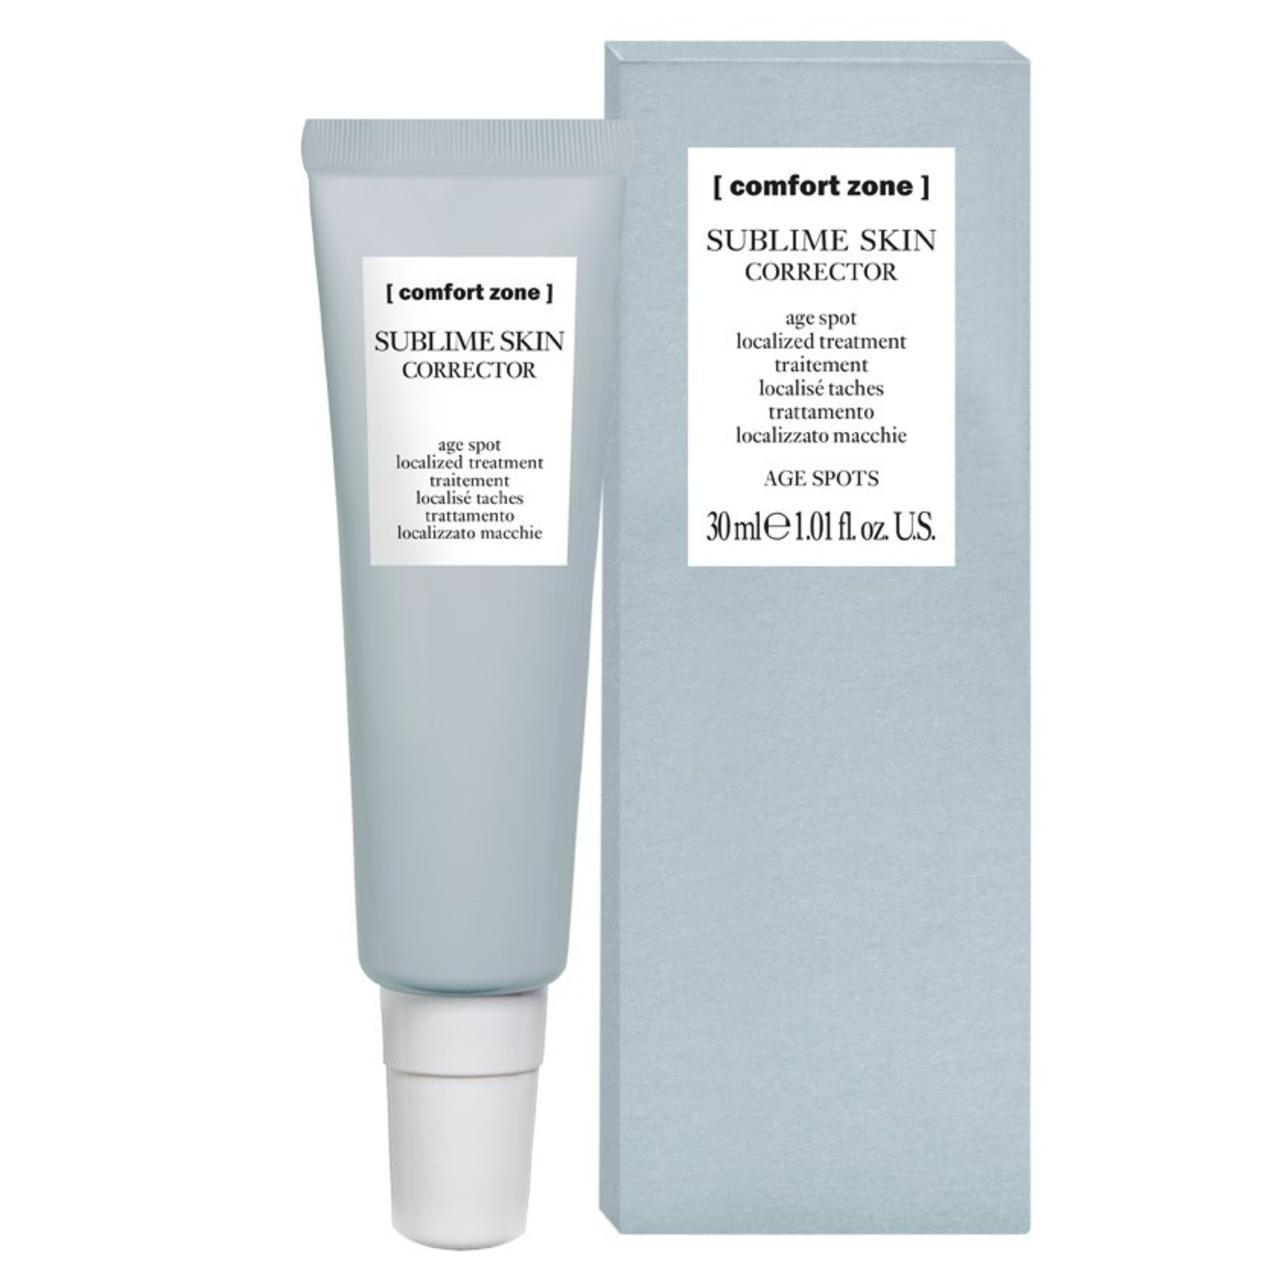 Comfort Zone Sublime Skin Corrector.